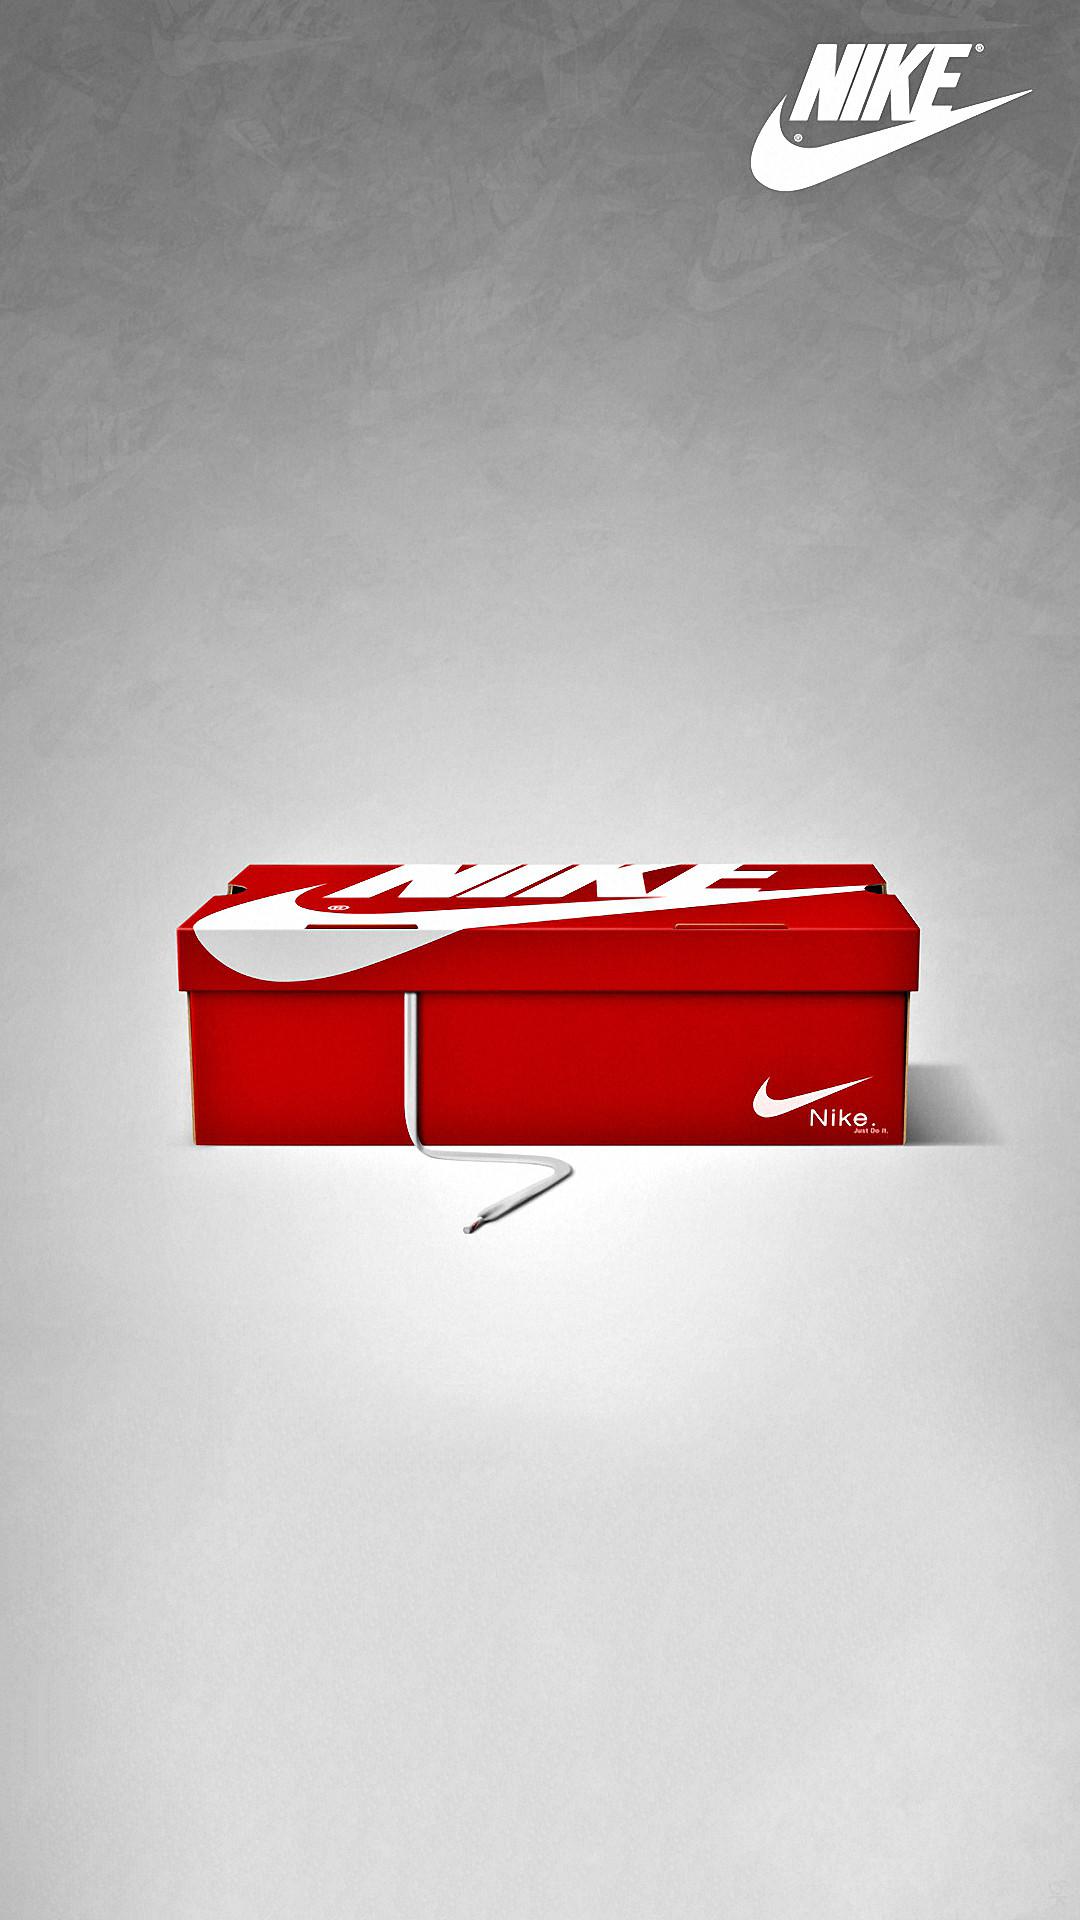 Nike Iphone 6 Wallpaper 74 Images